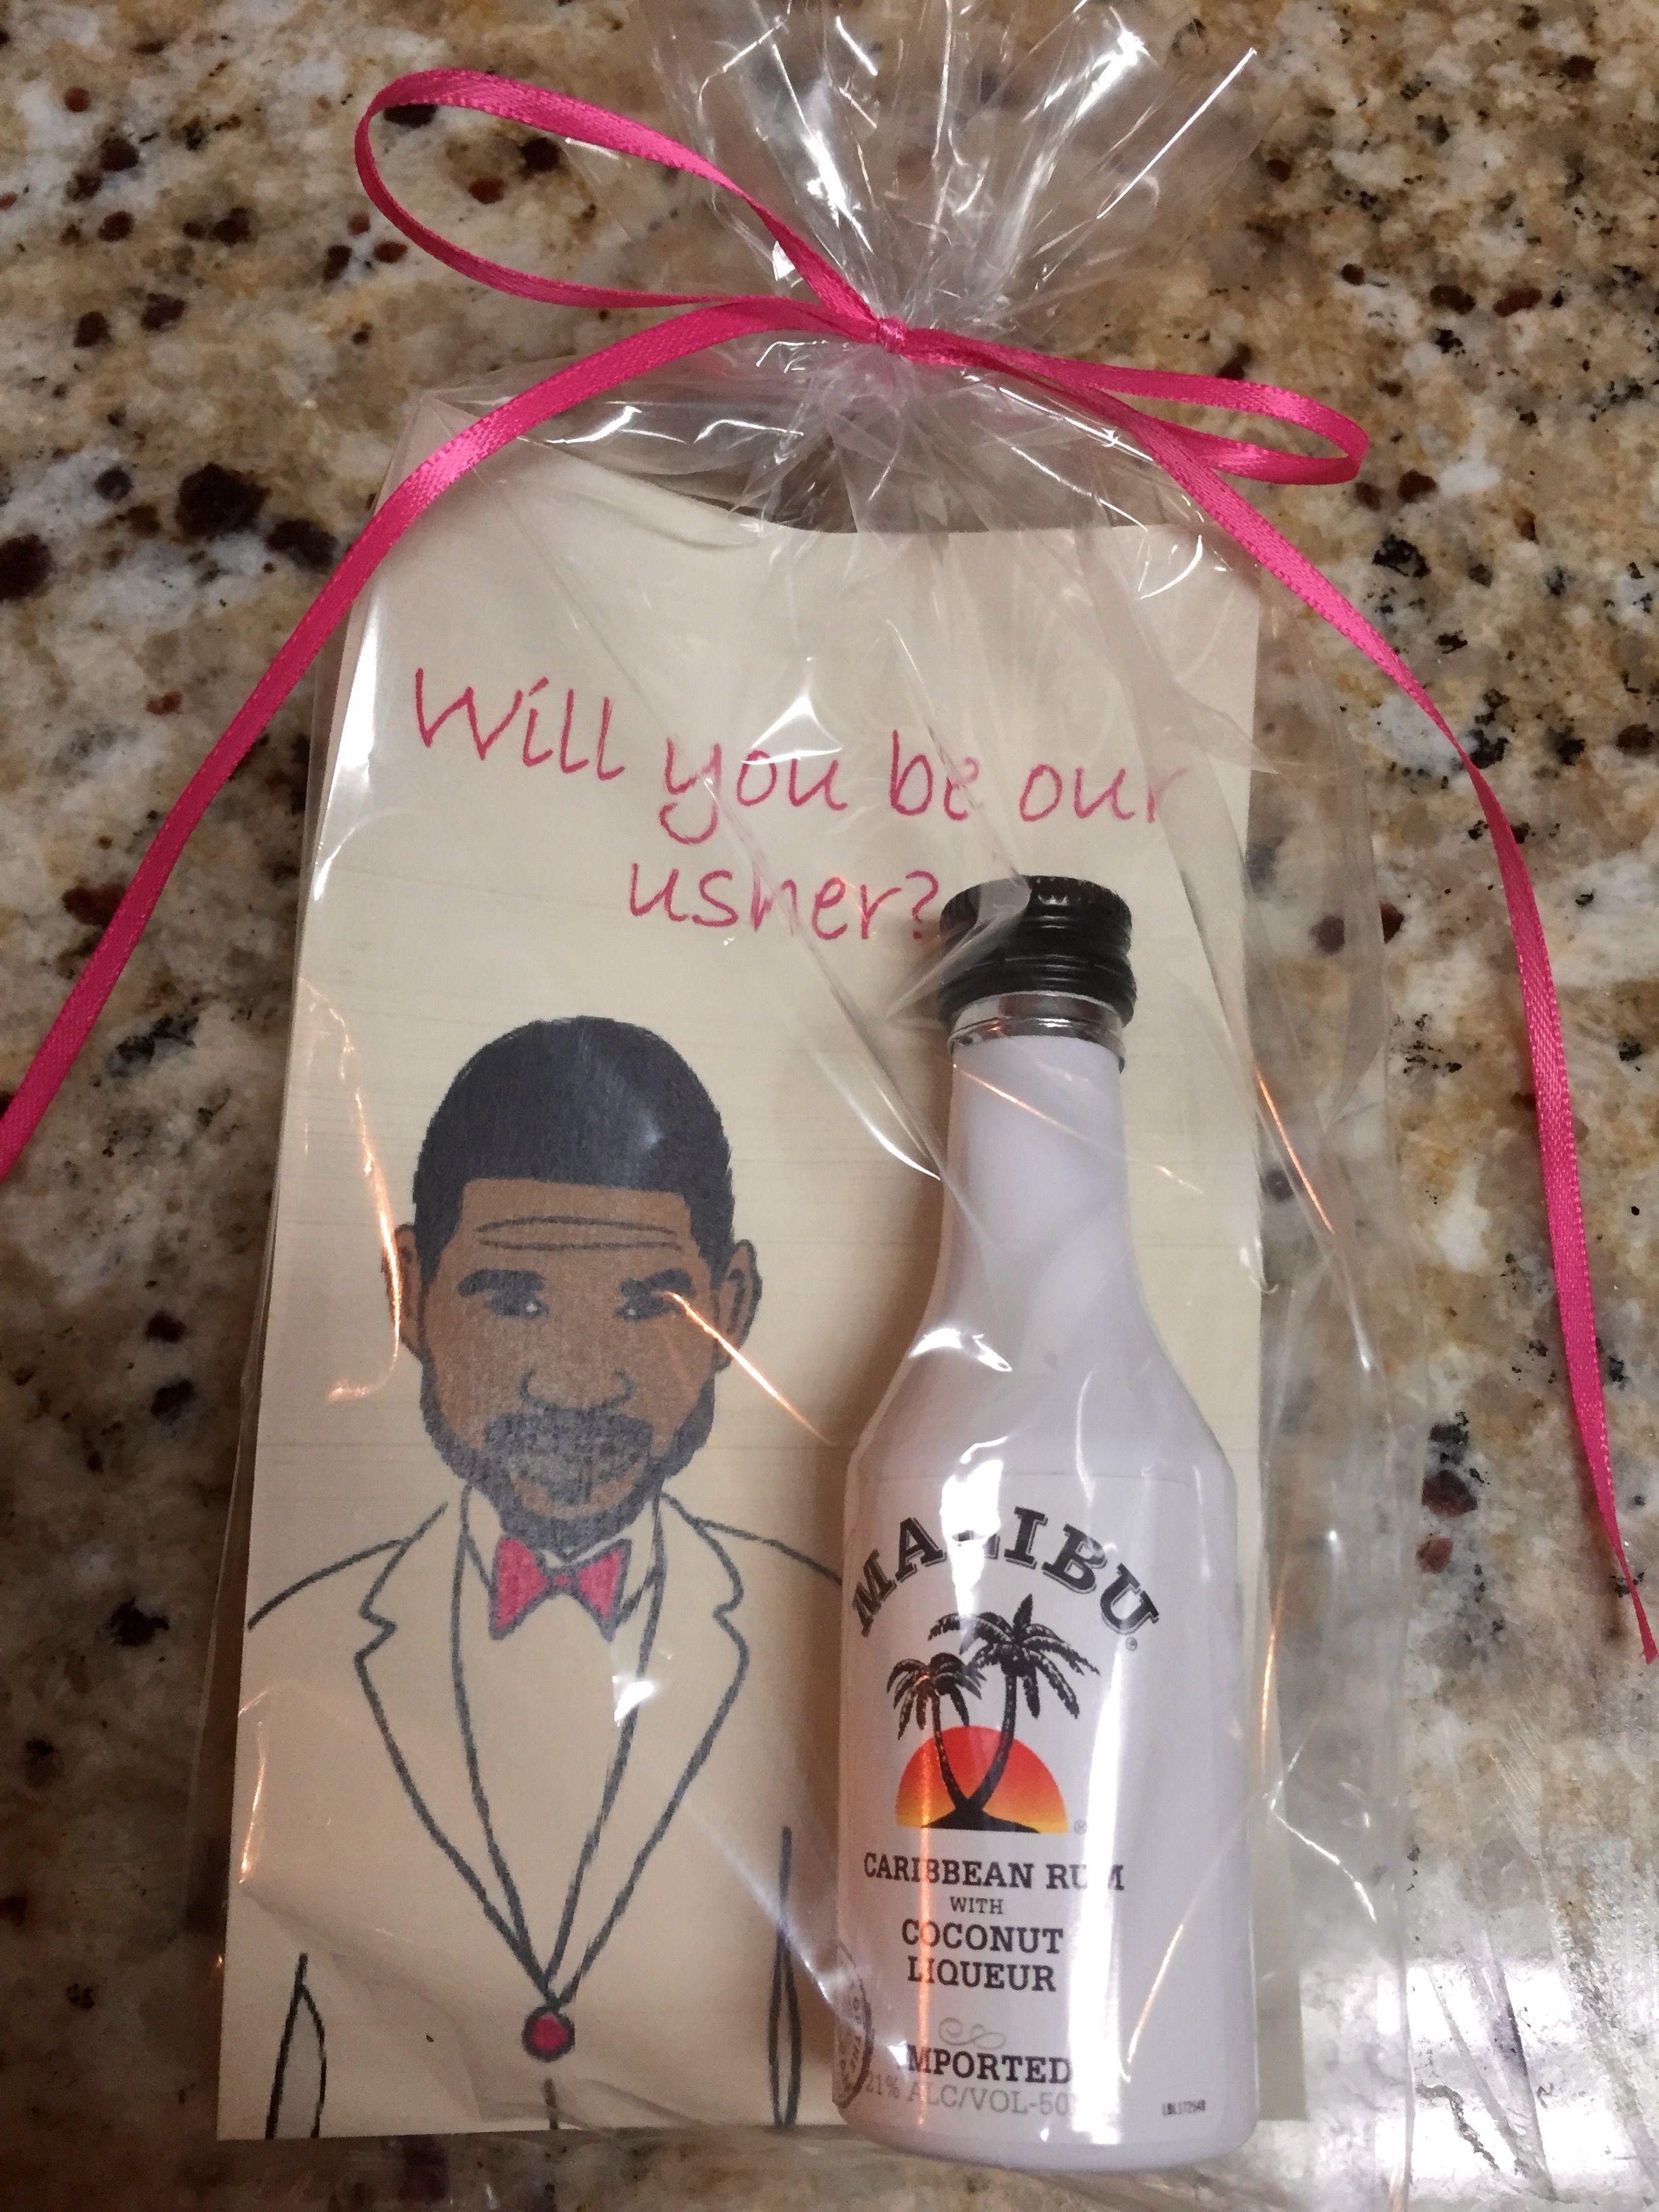 Usher Wedding Gifts: Gift For The Ushers